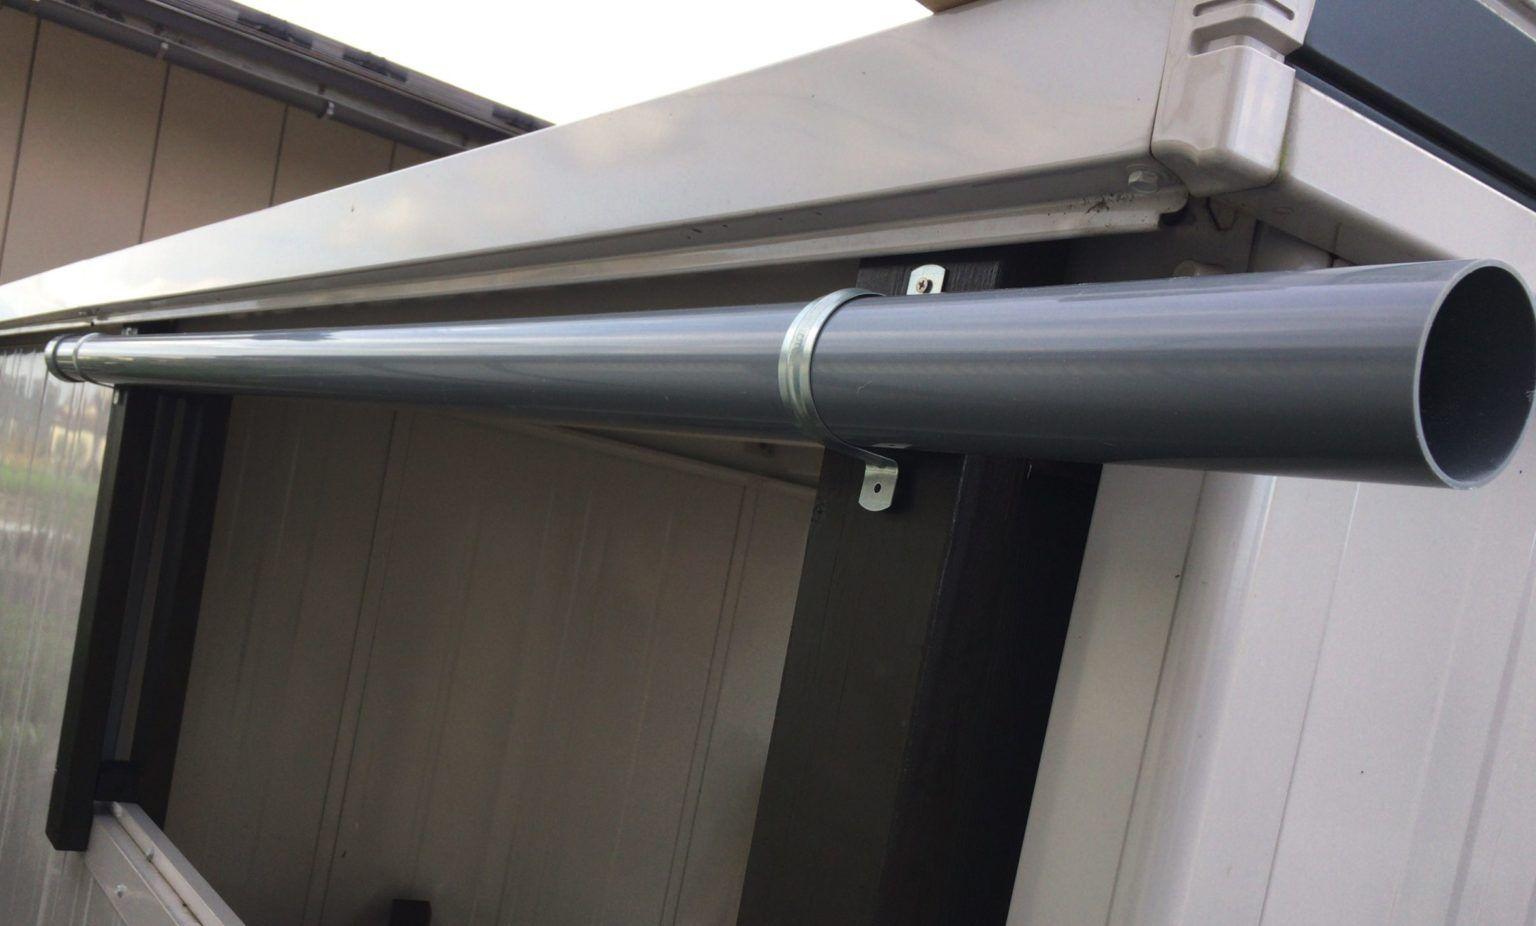 diy 自作 実践 雨水タンク設置と配管 2020 雨水タンク